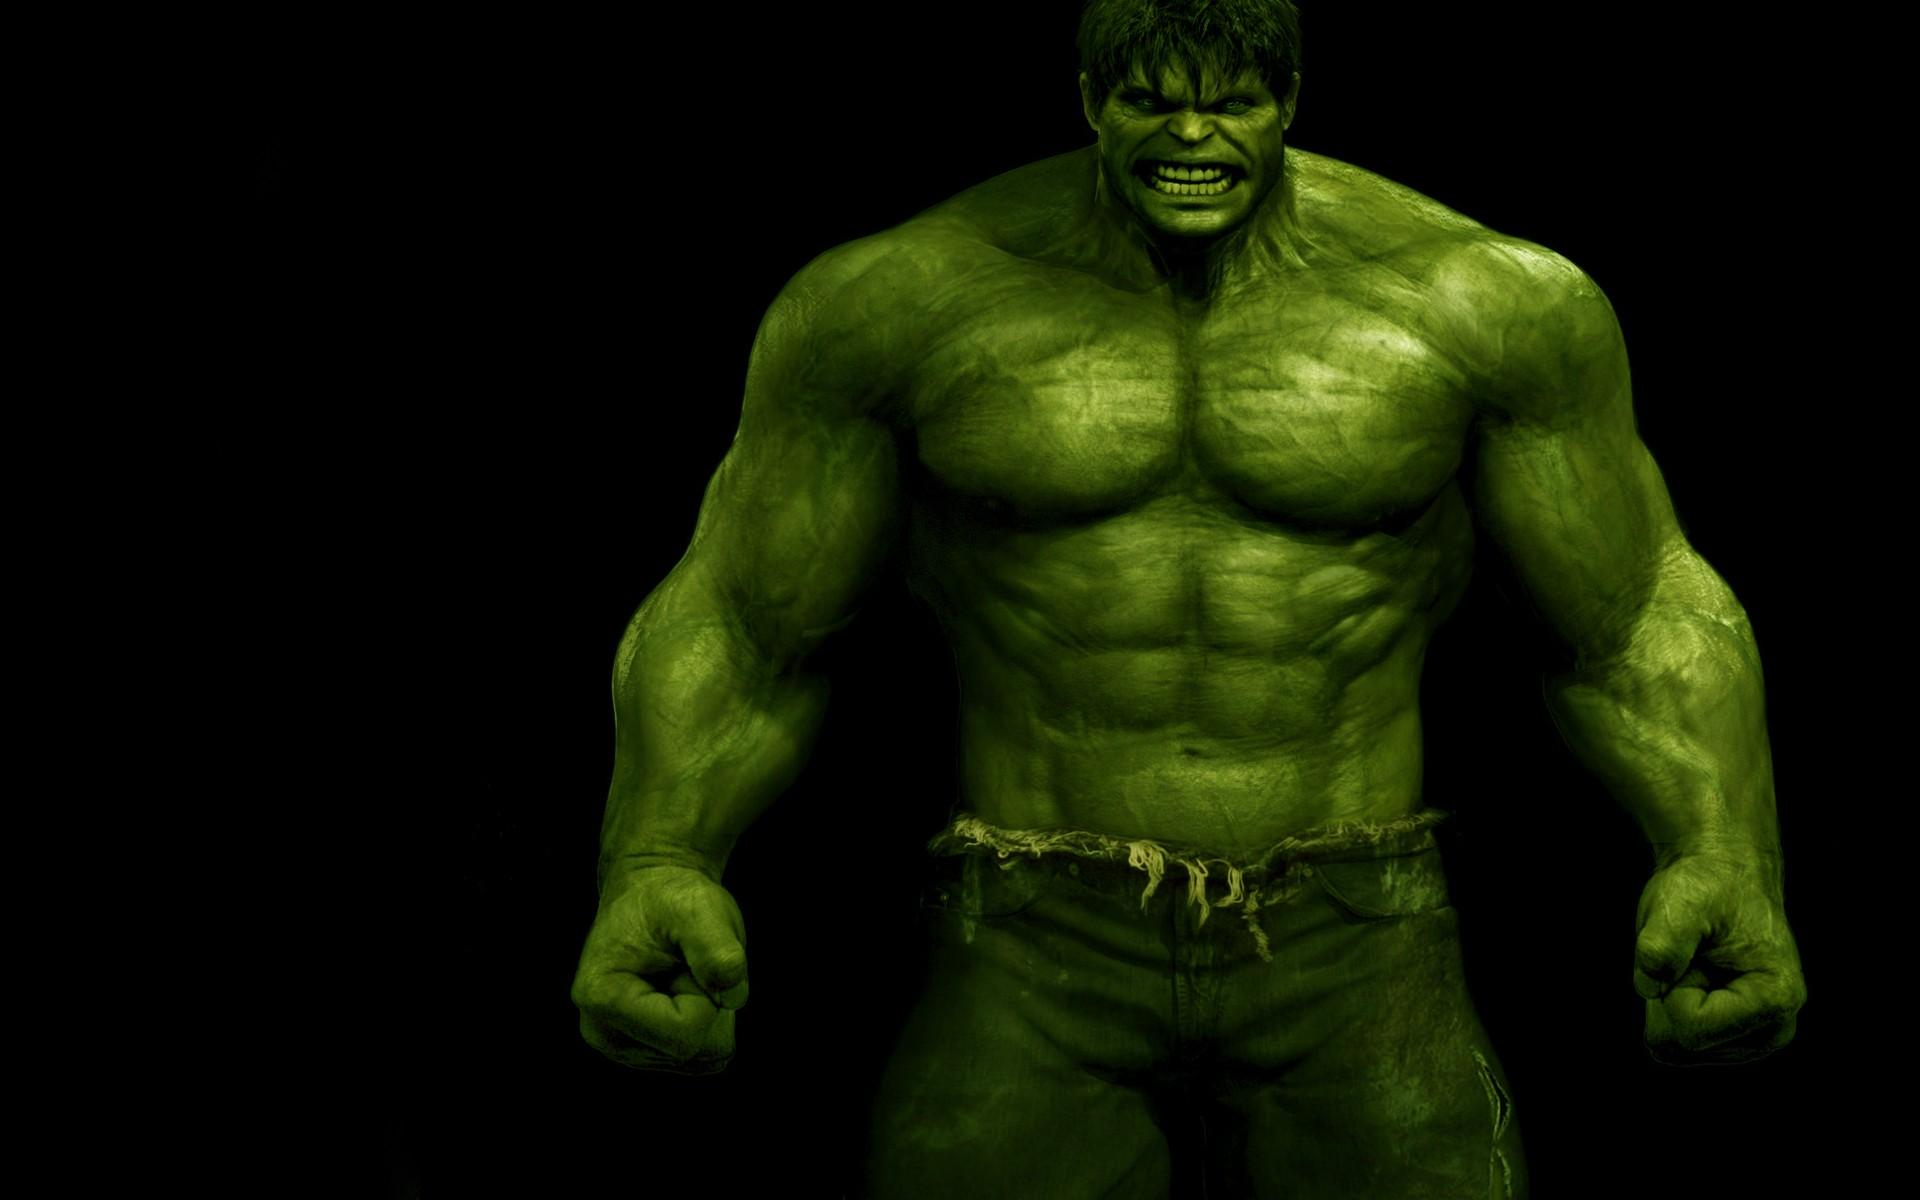 The Incredible Hulk HD Wallpaper 6277 1920x1200